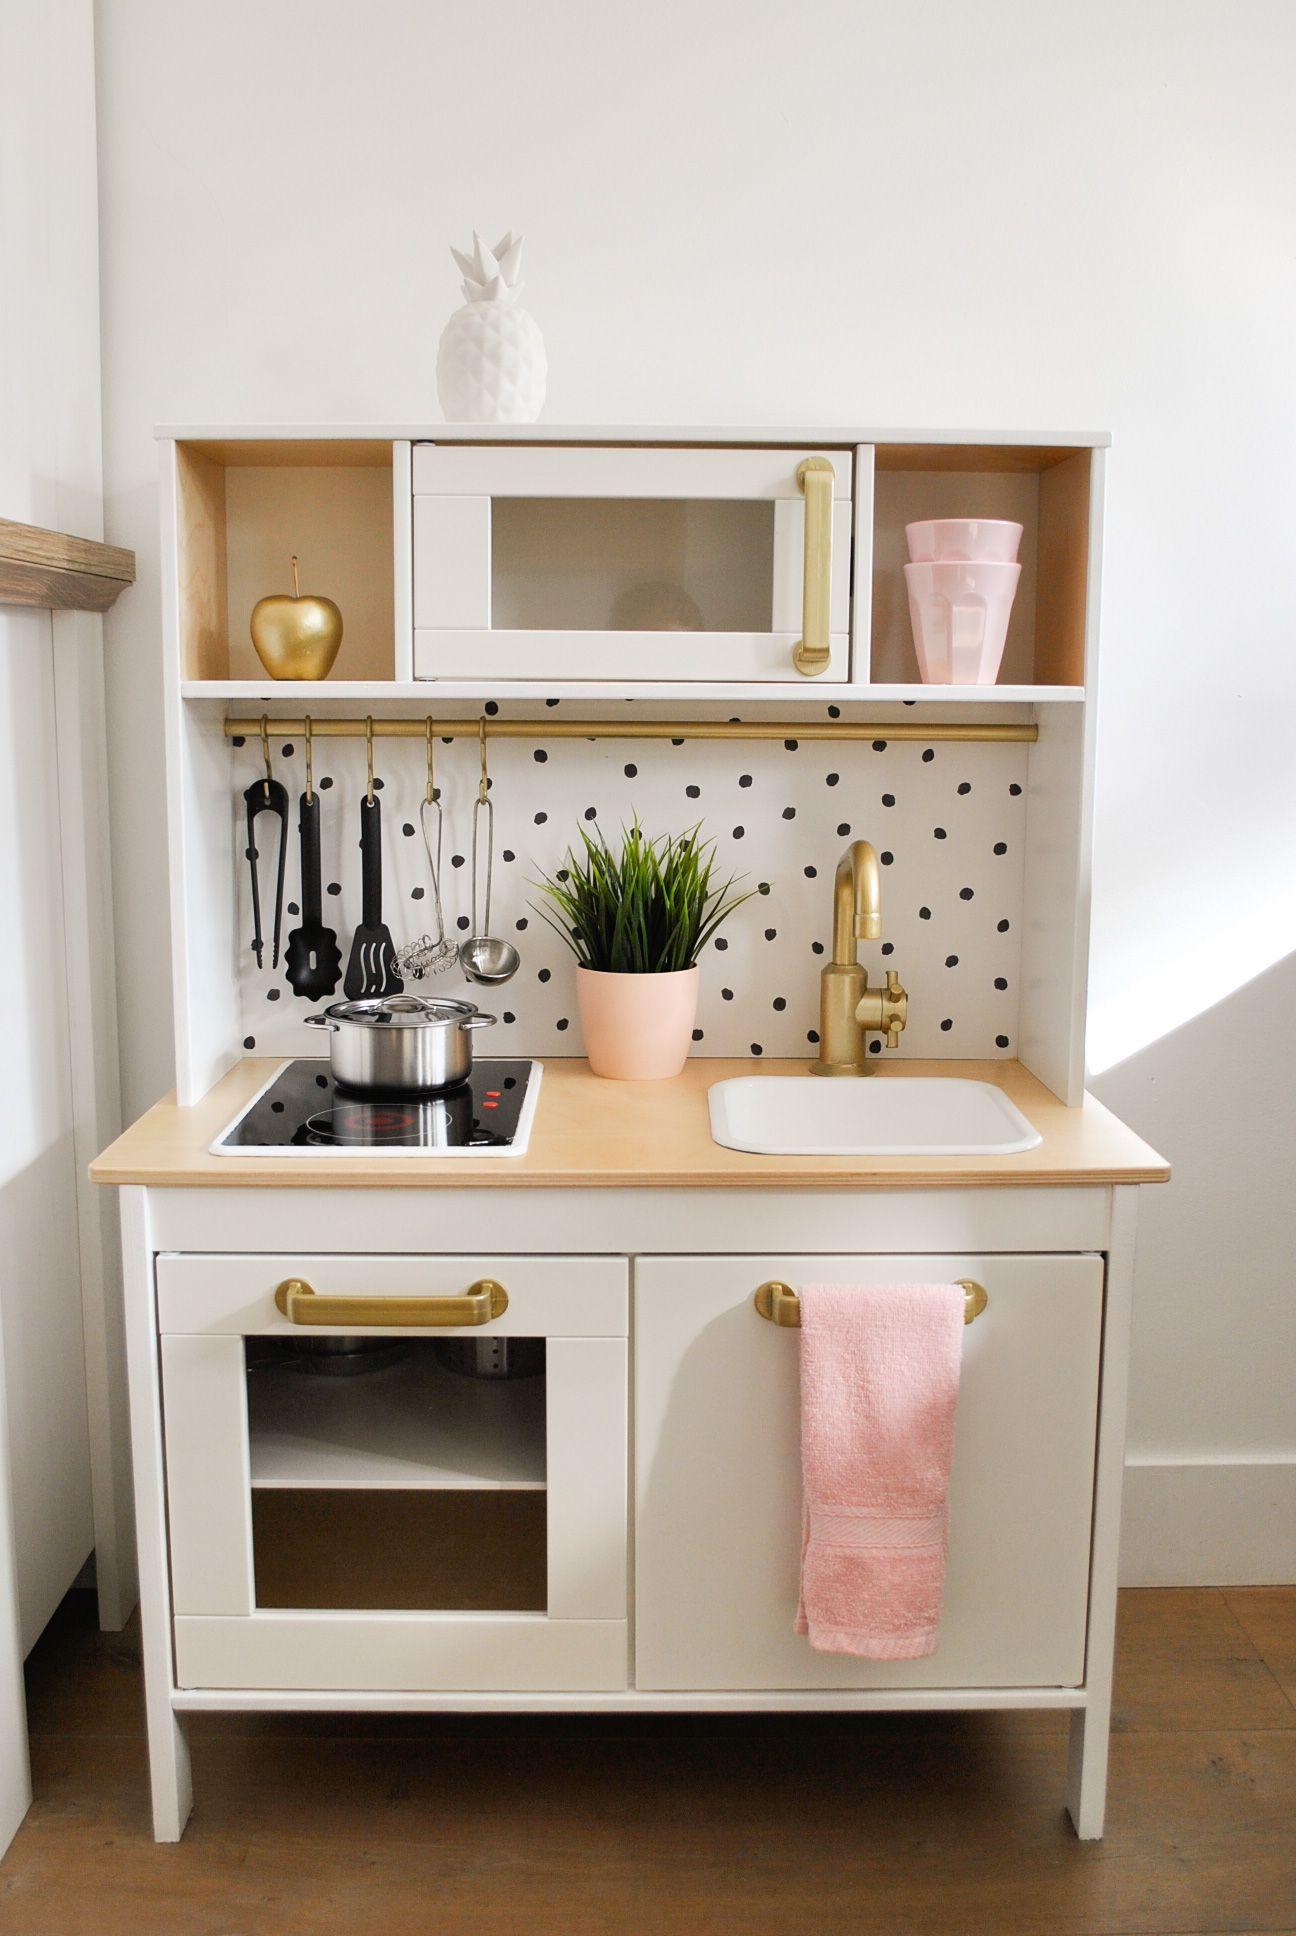 Ikea duktig kitchen #gardenplayhouse | mobili bimbi | Cucina ...